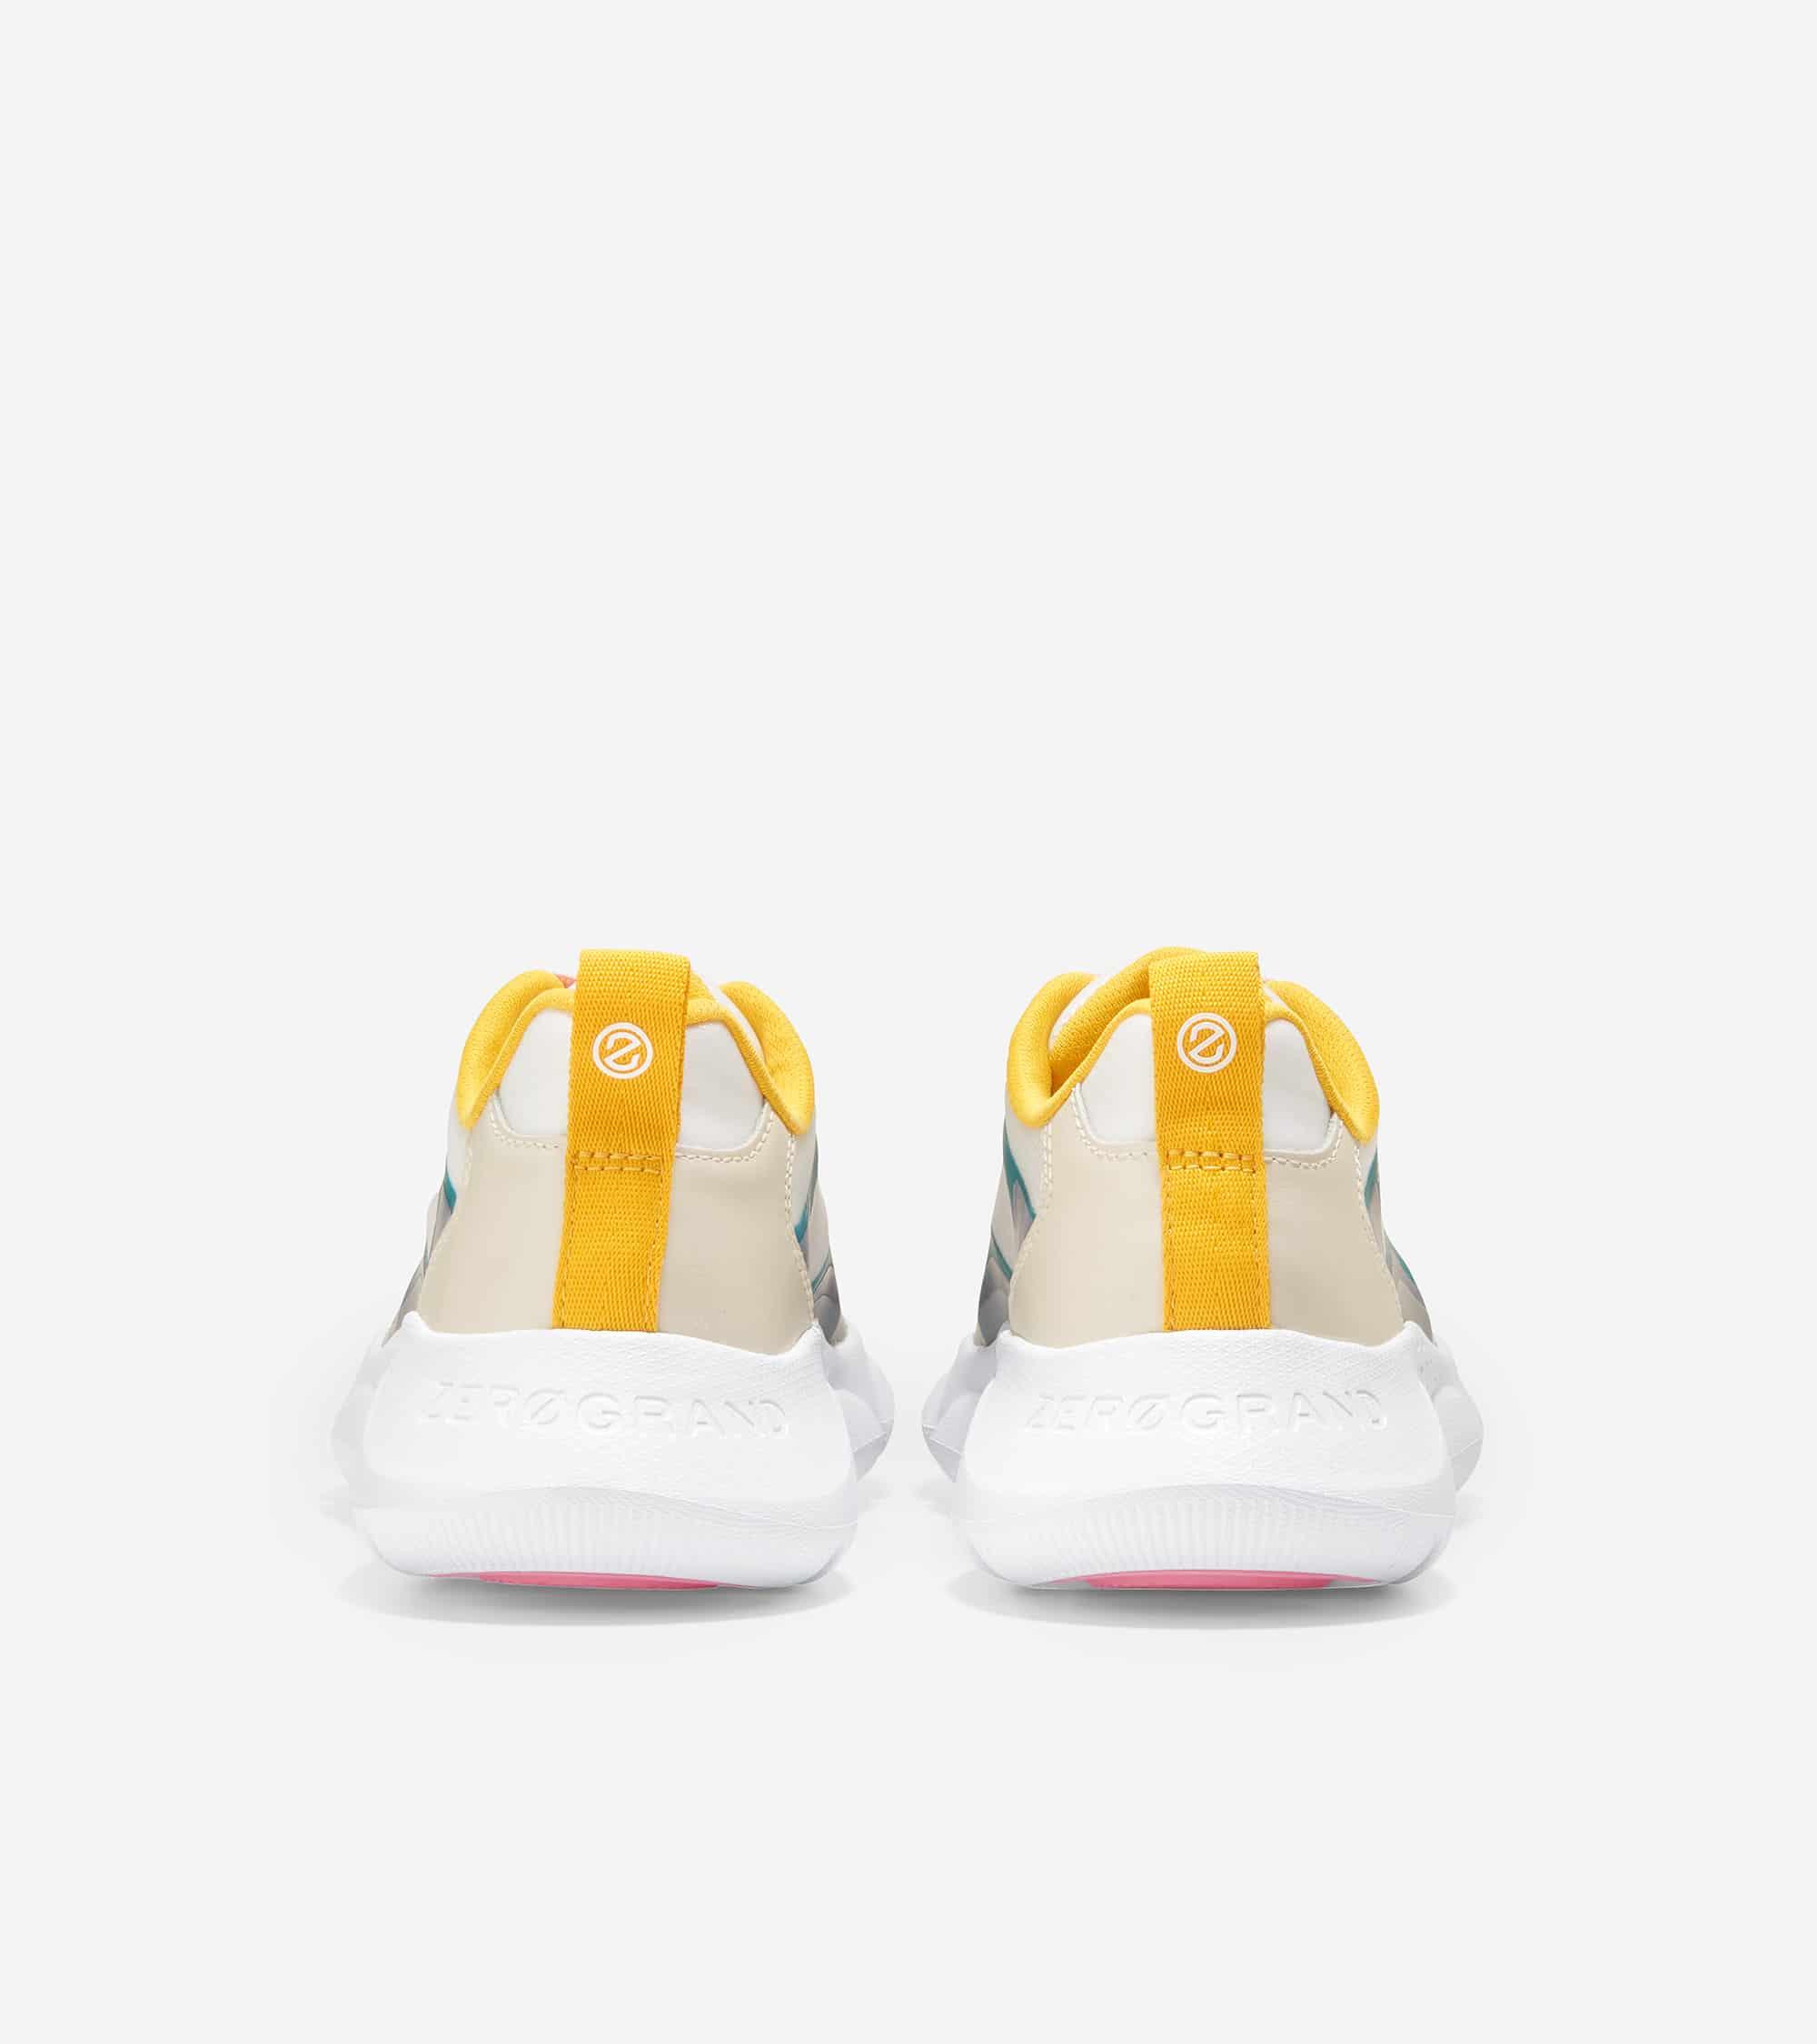 Cole Haan ZERØGRAND Radiant Sneaker White Cap/Tropical Pink/ Deep Lake Tpu/ Whitecap & White Leather/ Golden Rod/ Optic White